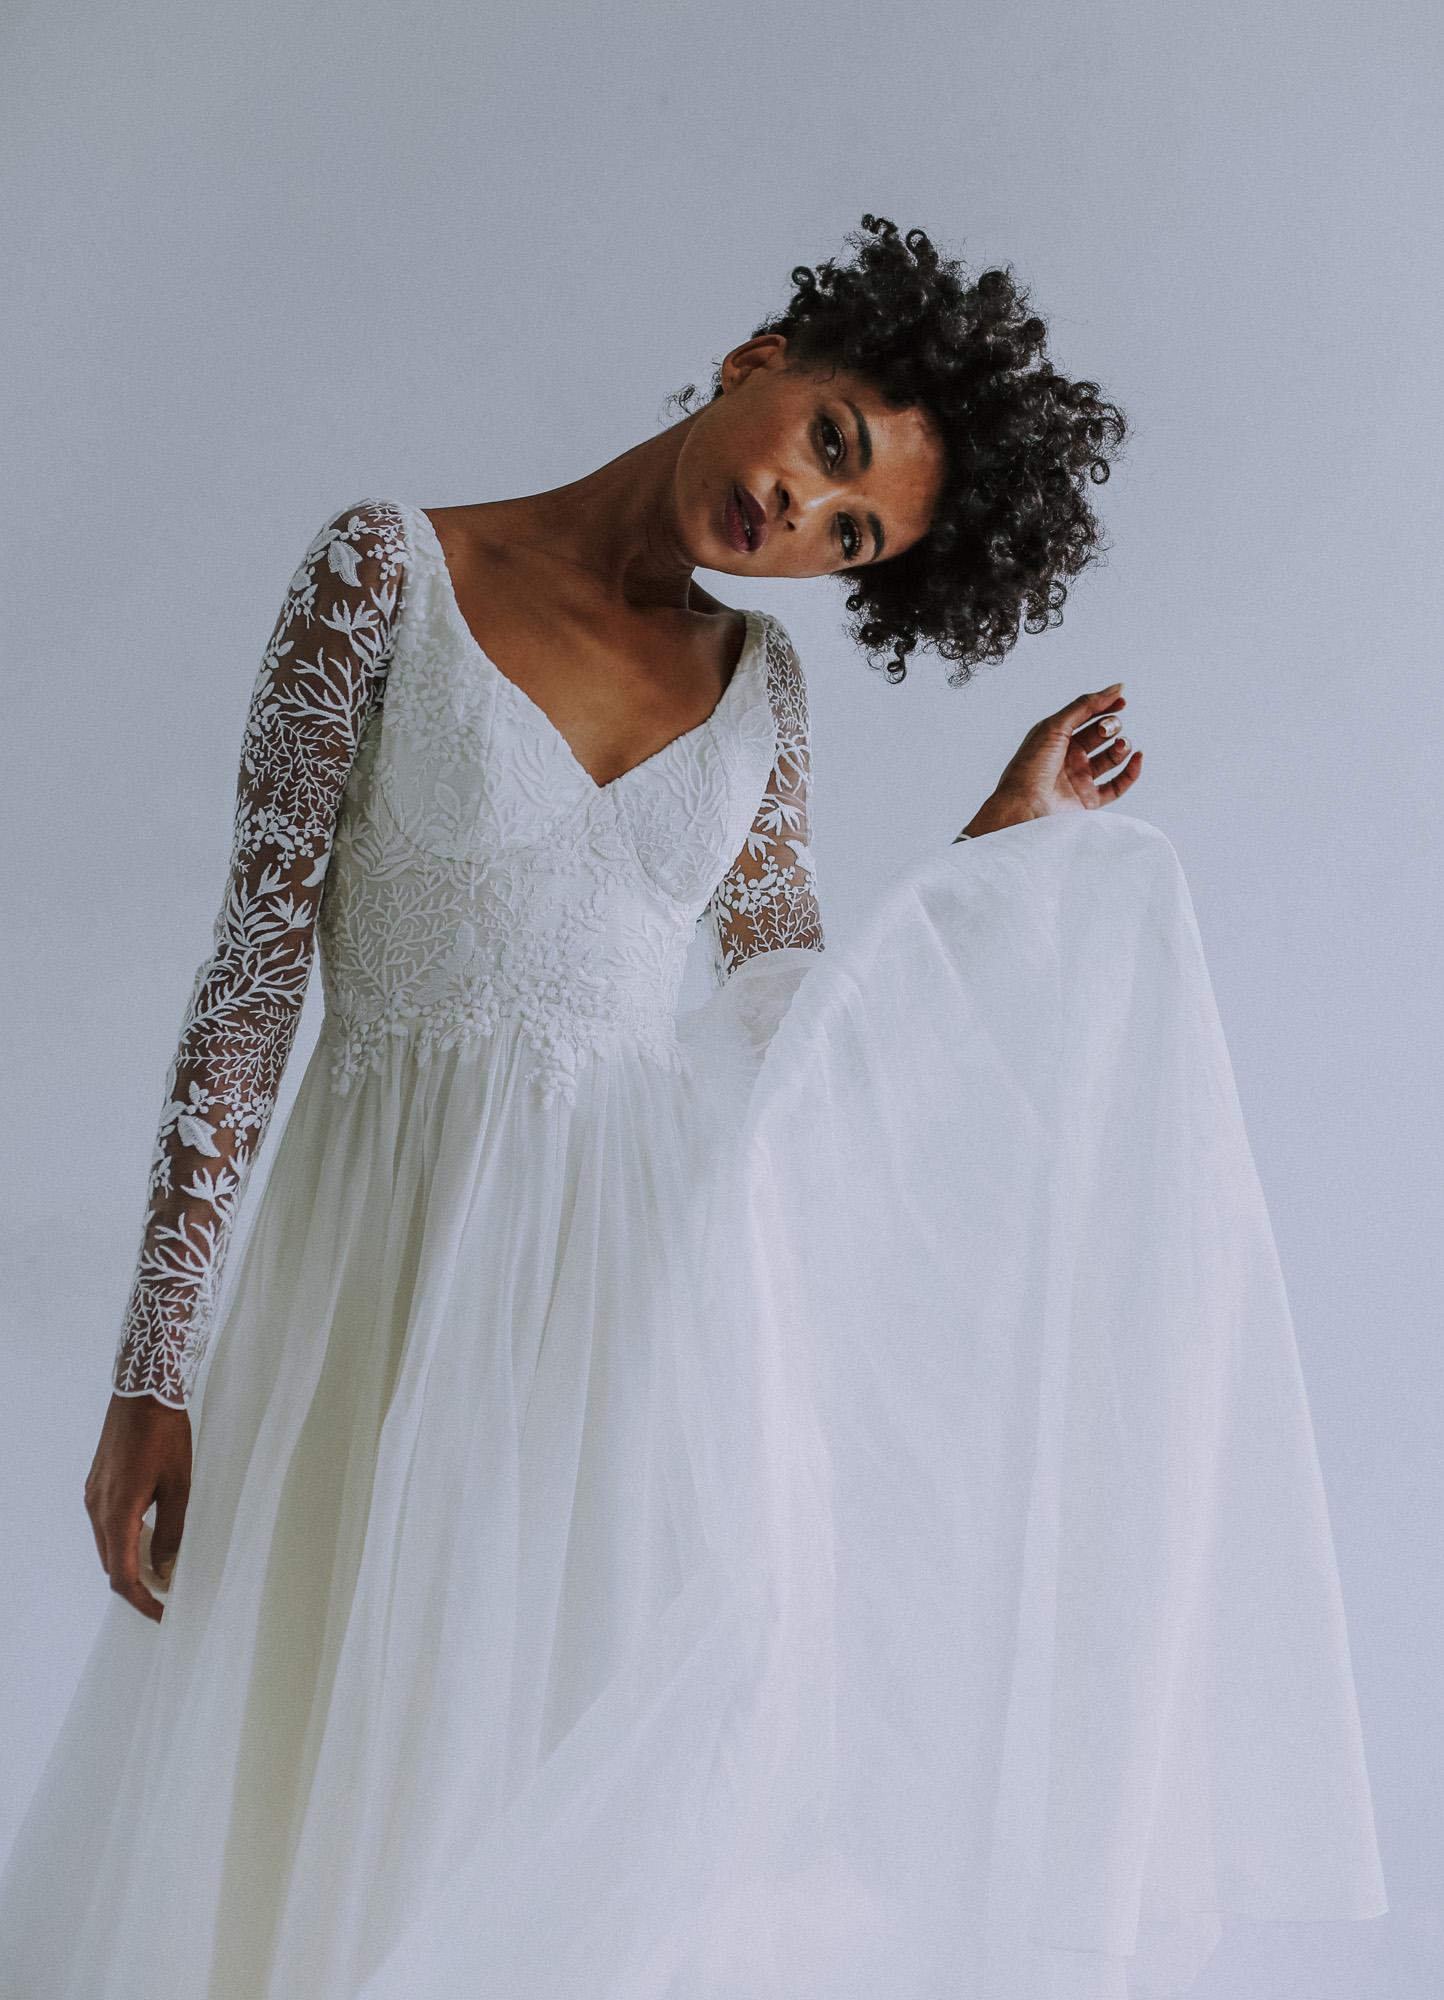 leanne-marshall-wedding-gown-6.jpg